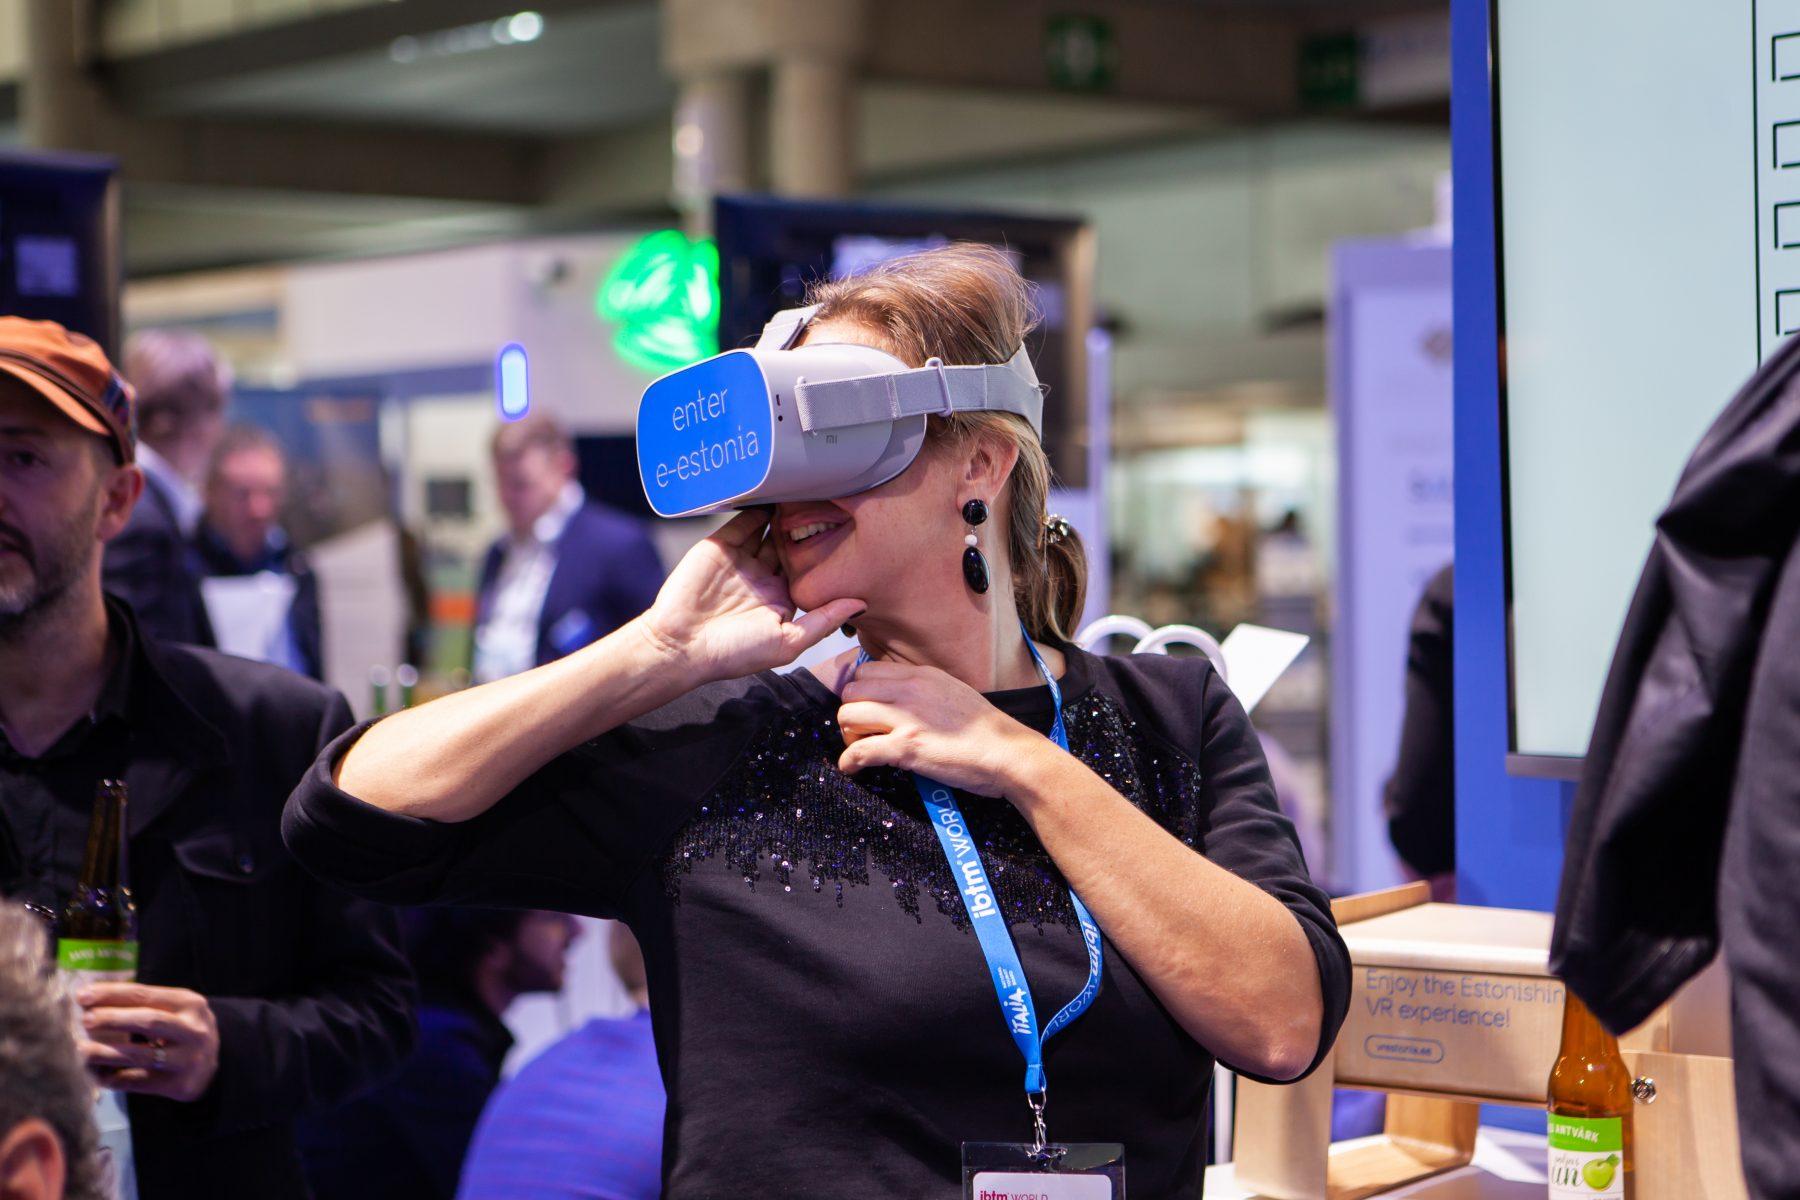 Smart city expo VR experience